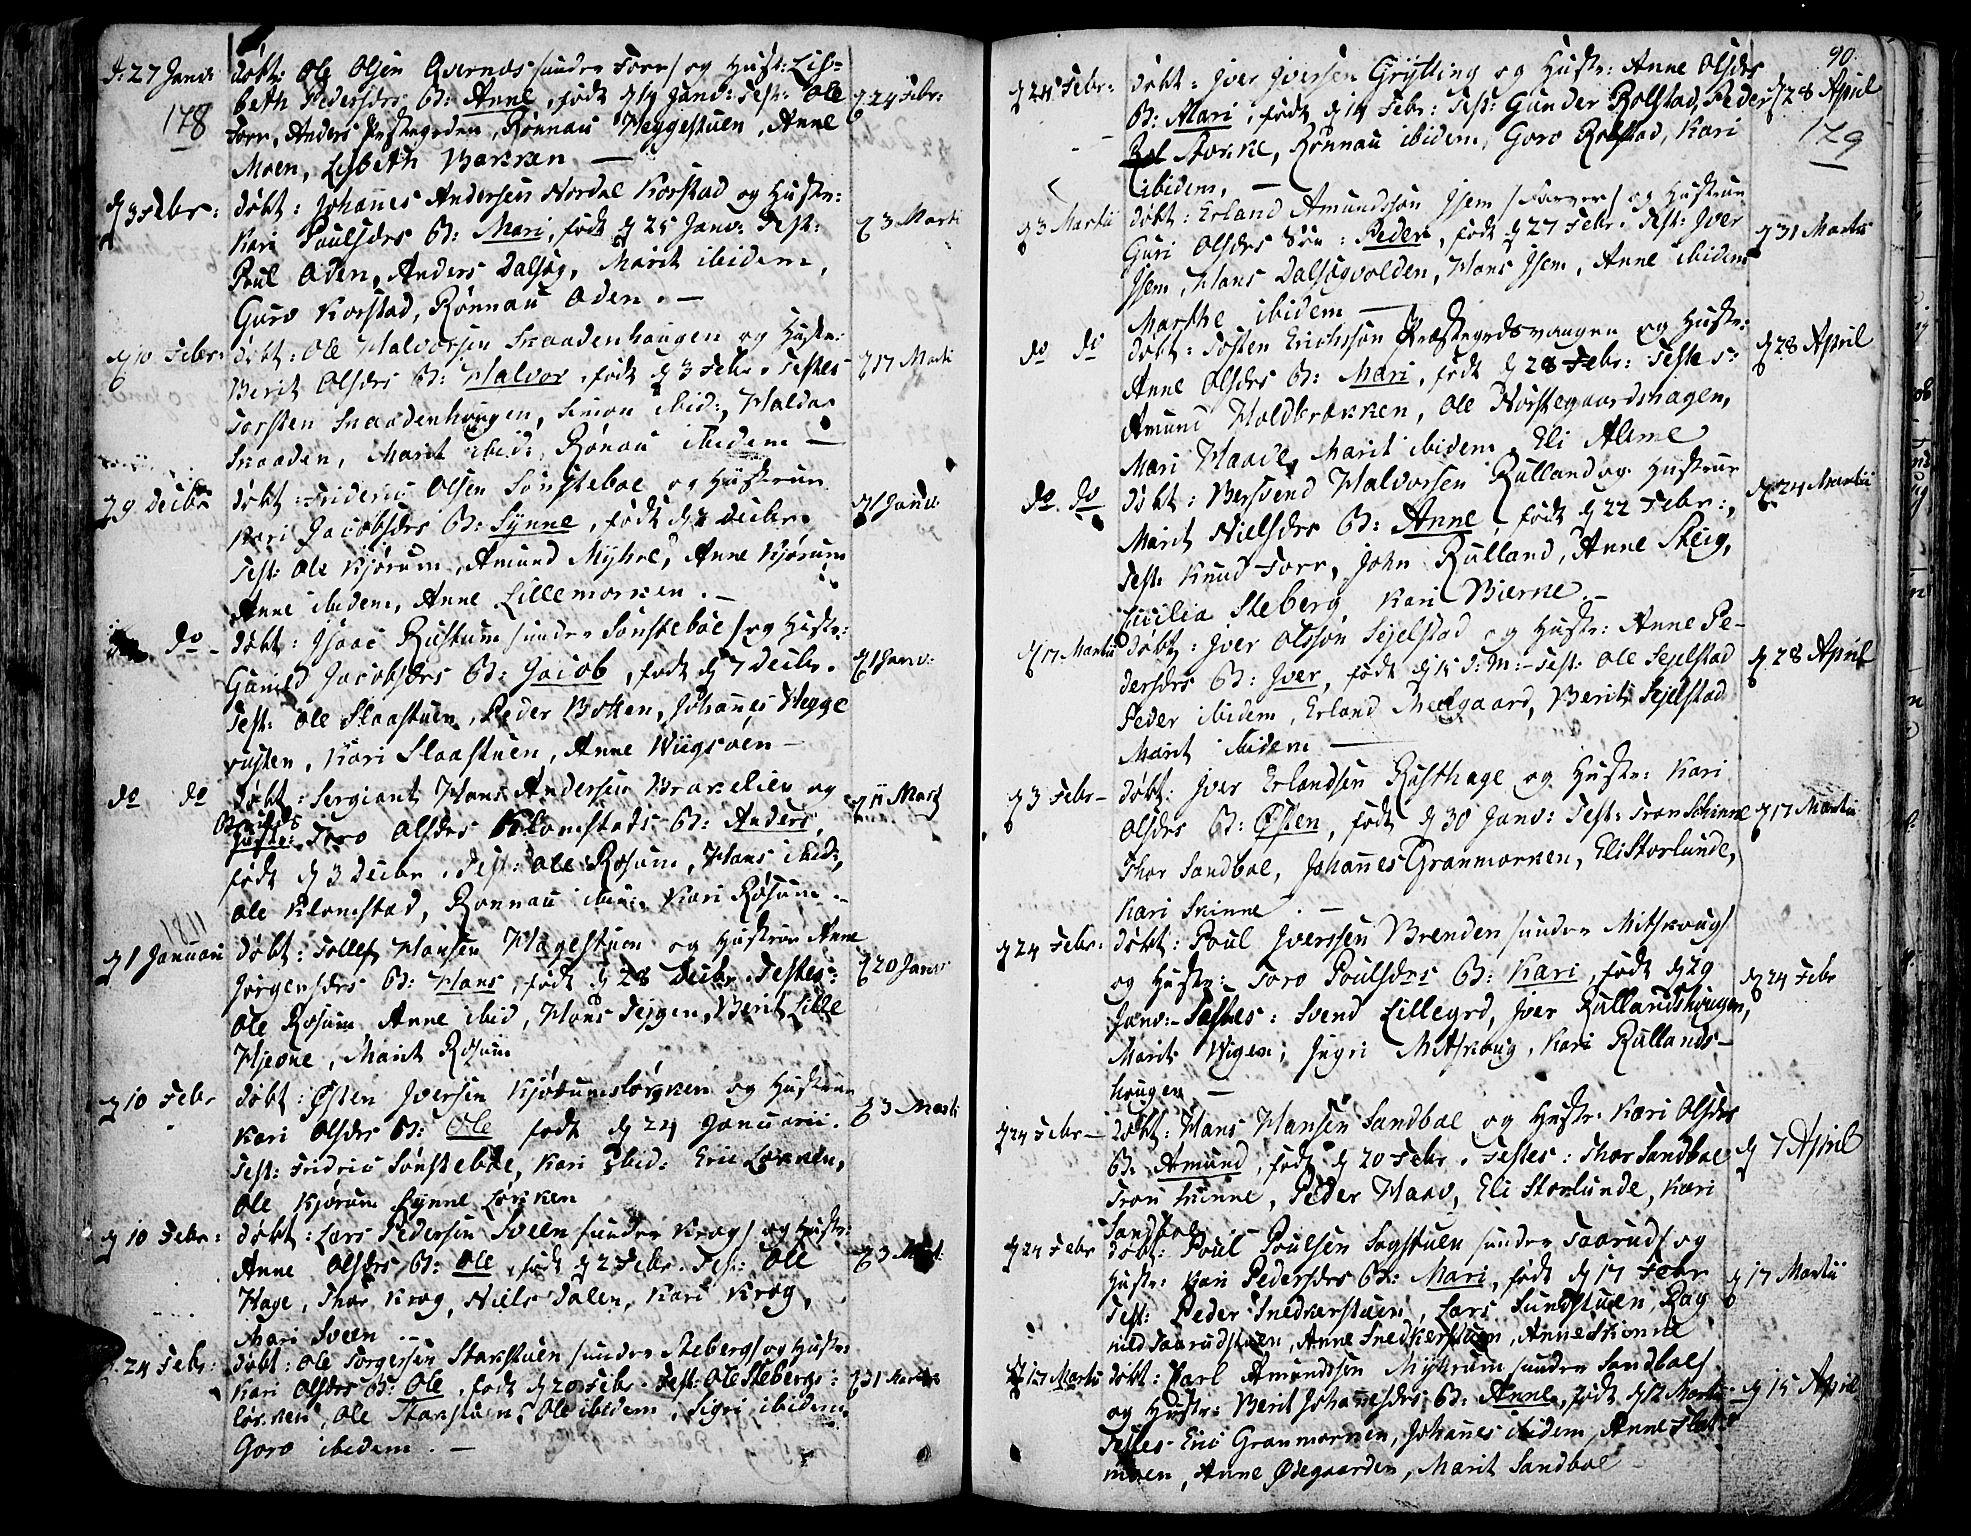 SAH, Fron prestekontor, H/Ha/Haa/L0001: Ministerialbok nr. 1, 1799-1816, s. 178-179